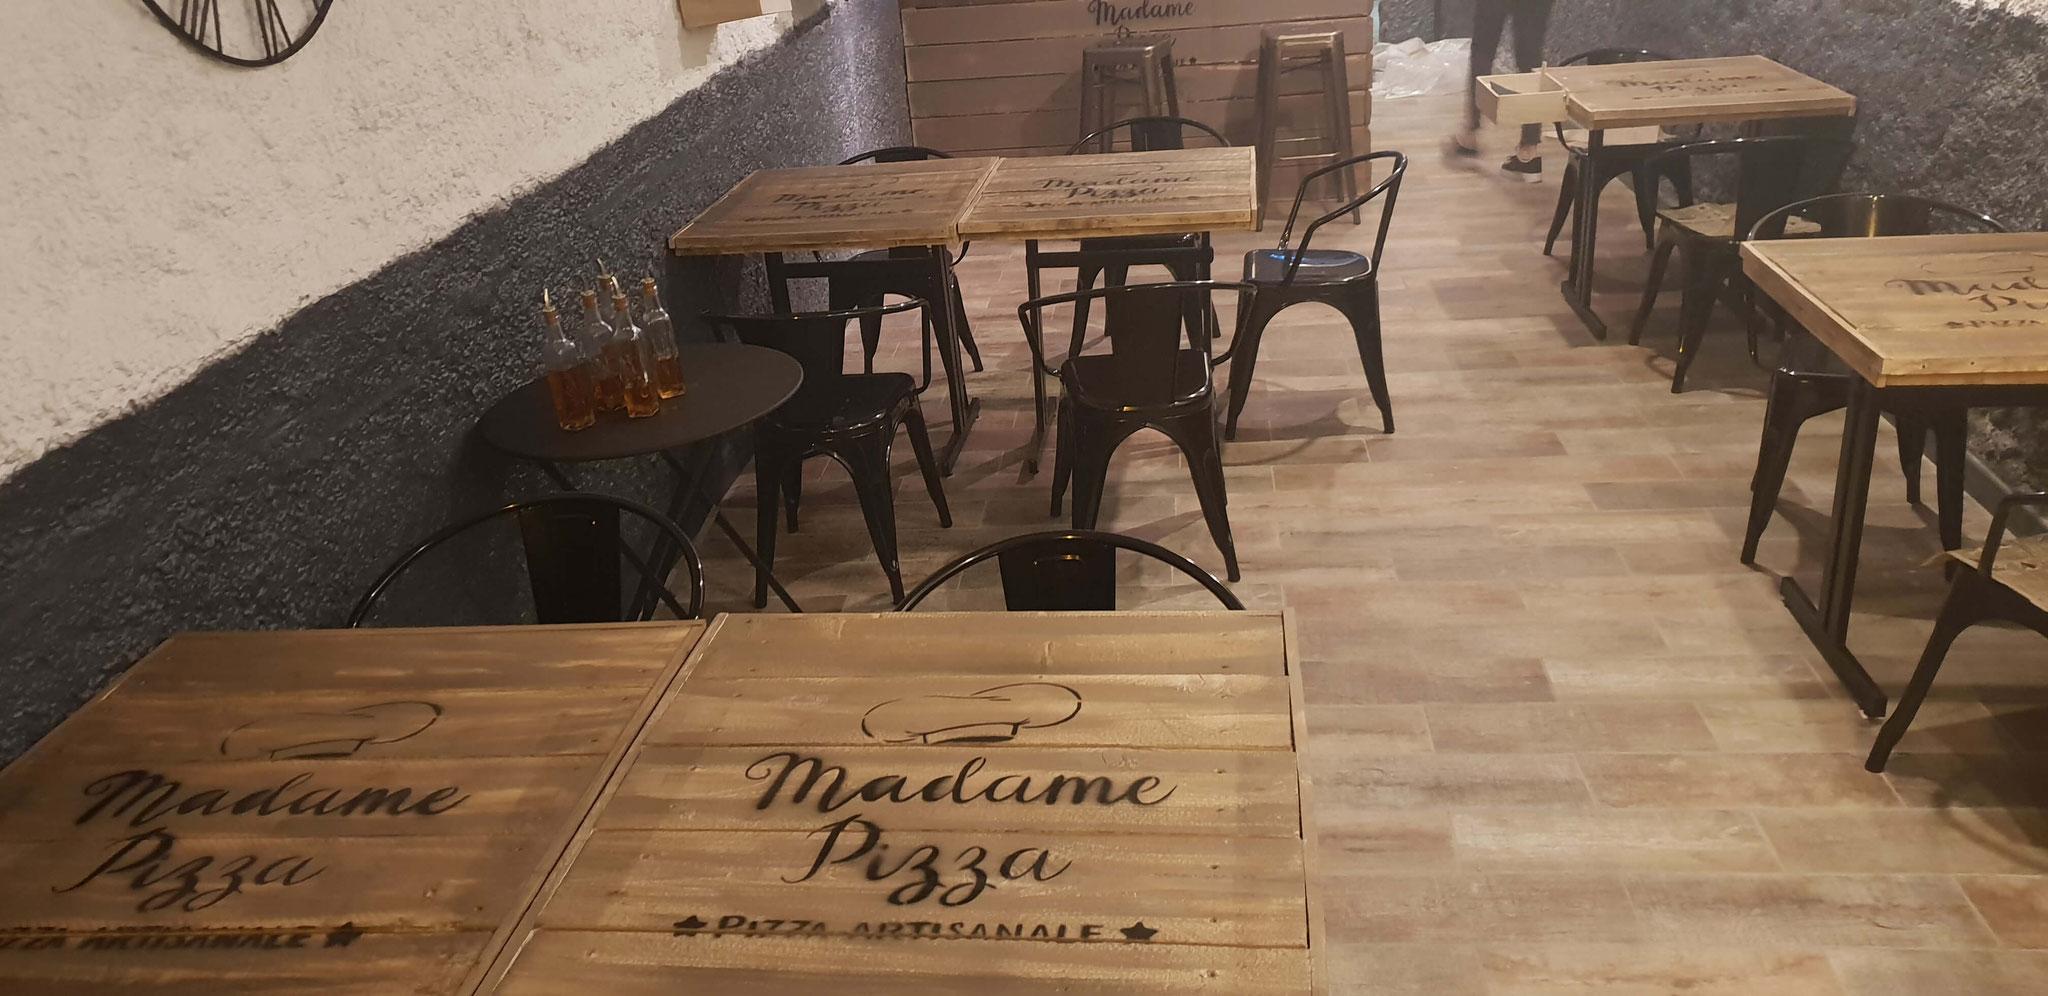 pochoir-personnalise-logo-pour-restaurant.jpg